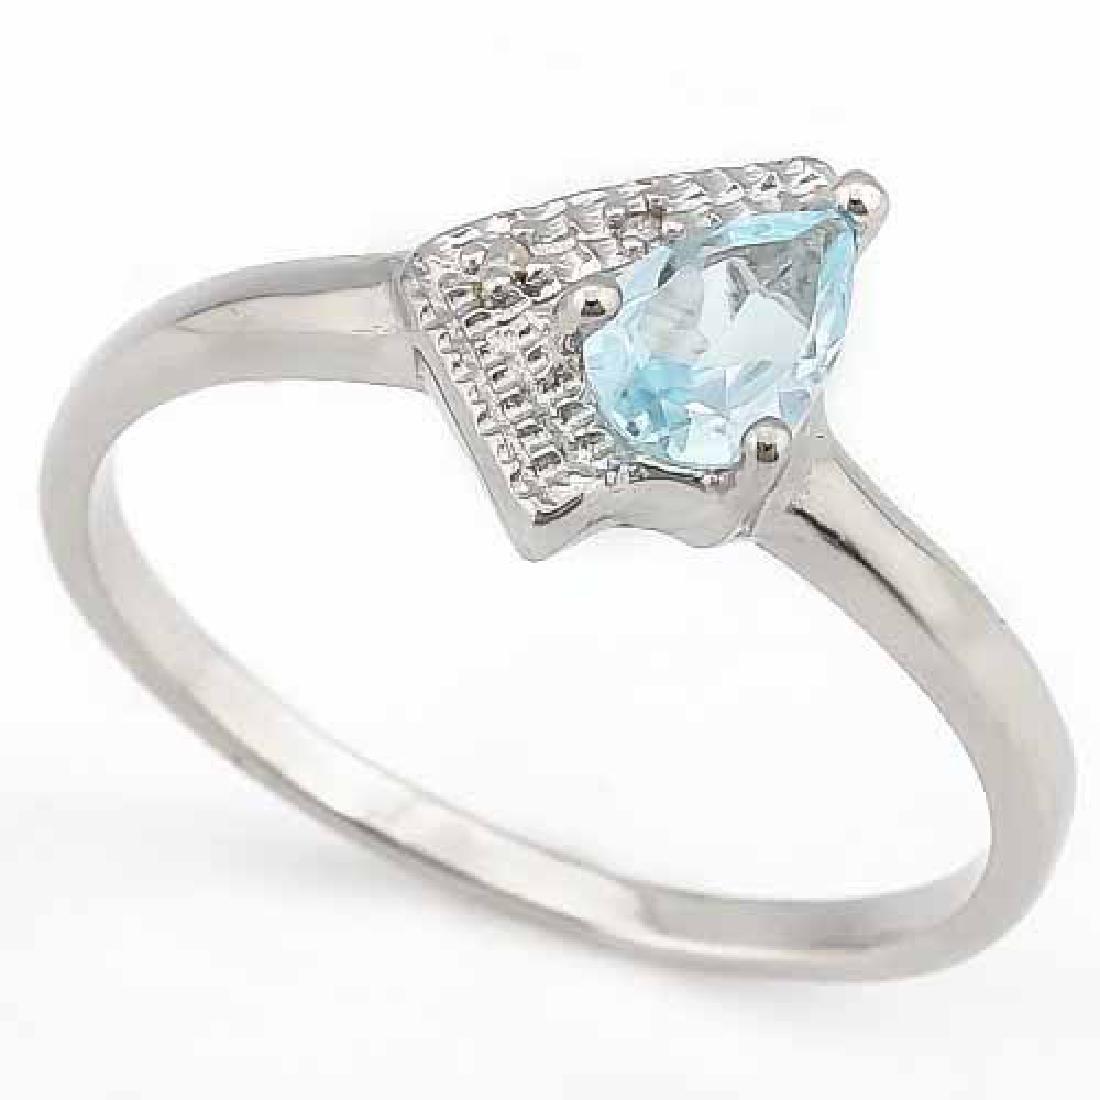 1/3 CARAT AQUAMARINE & DIAMOND 925 STERLING SILVER RING